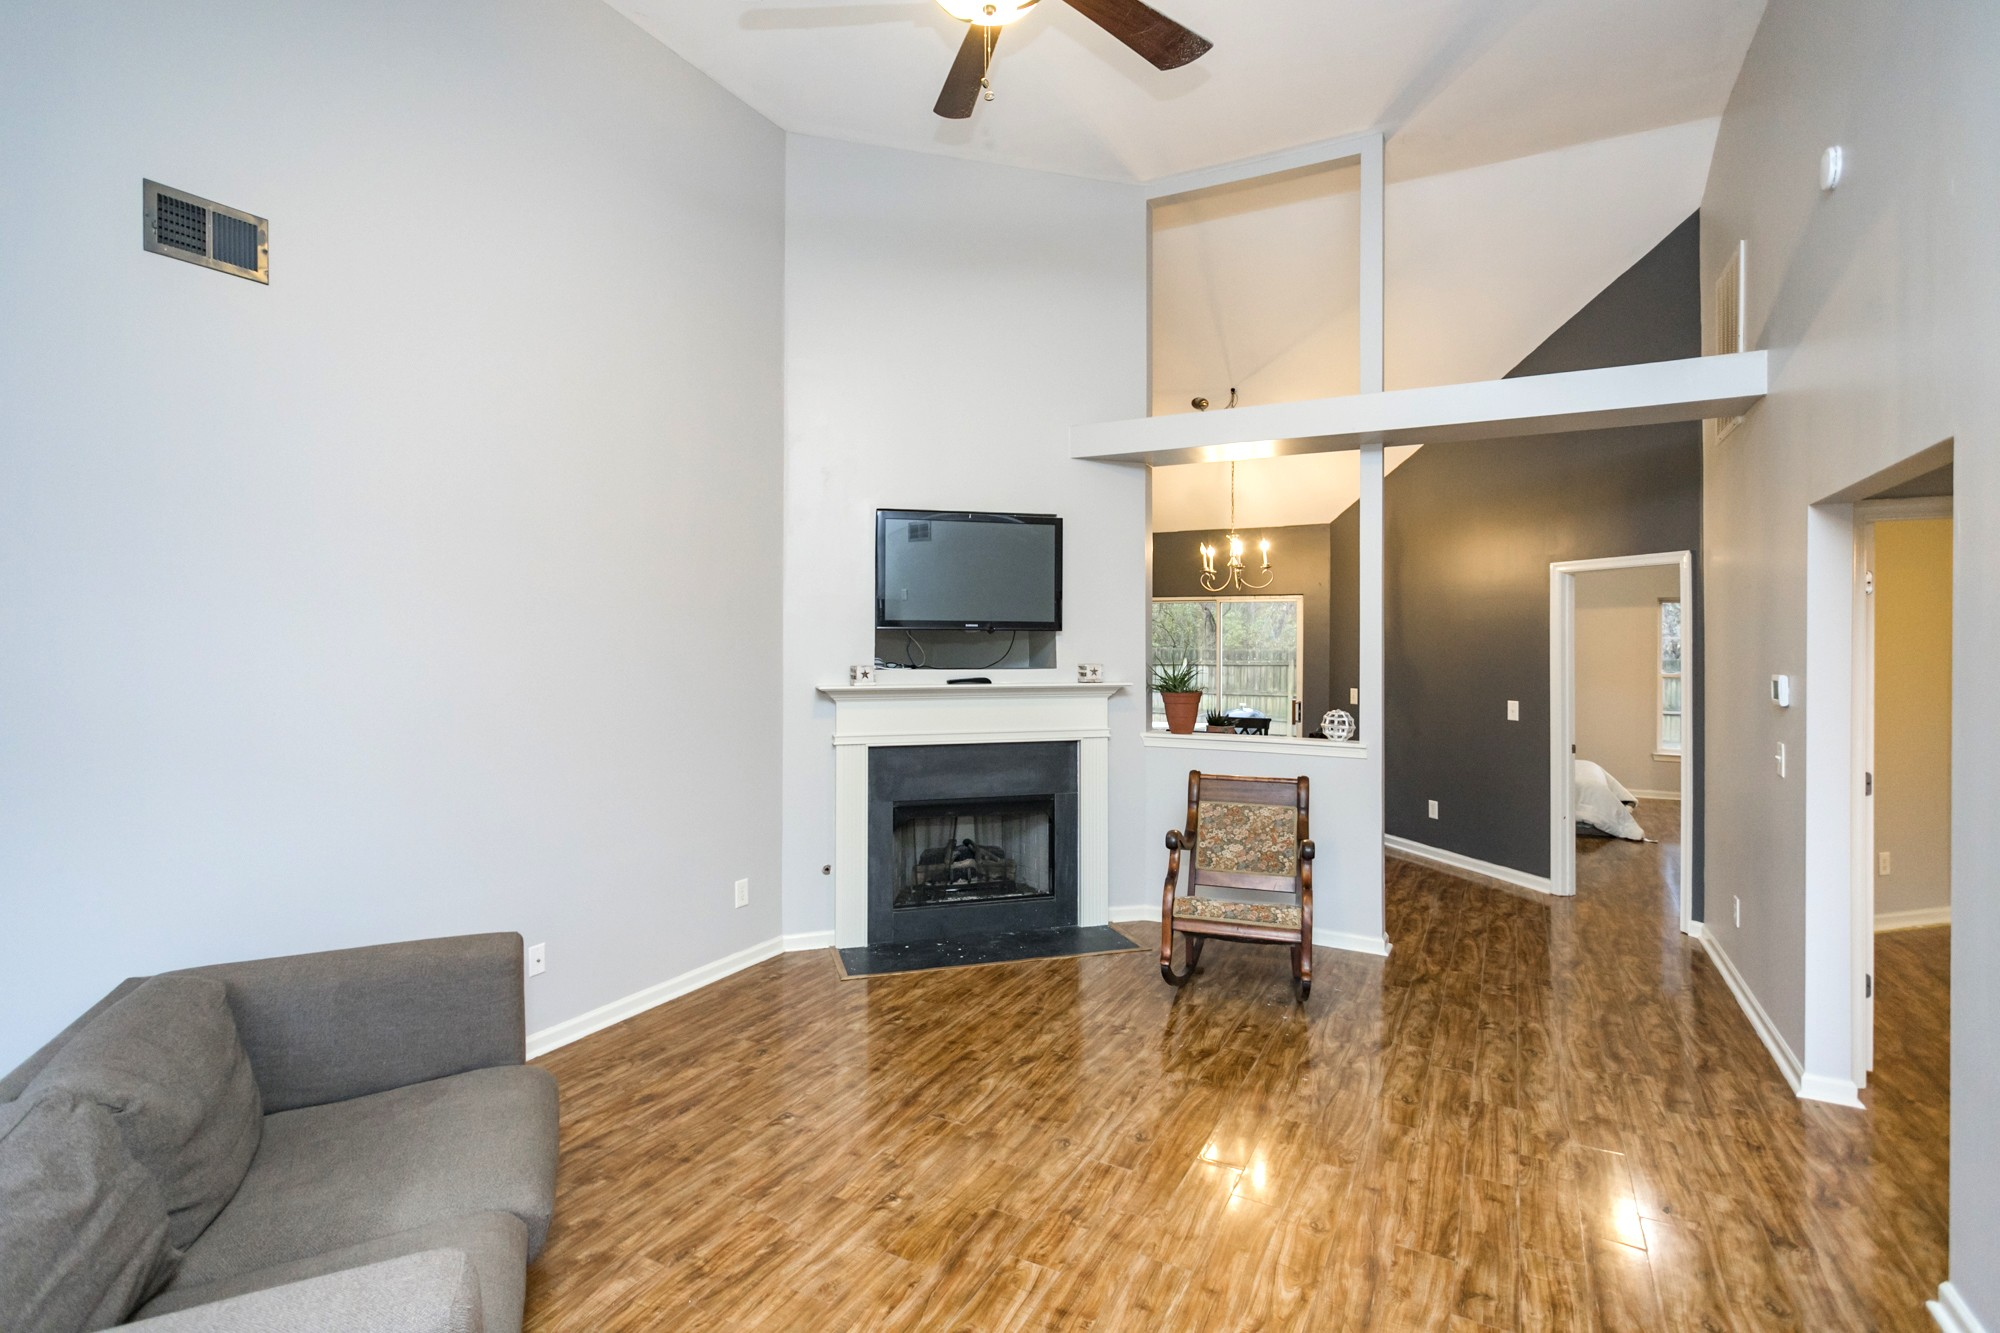 5160 Ryan Allen Cir, Whites Creek, TN 37189 - Whites Creek, TN real estate listing